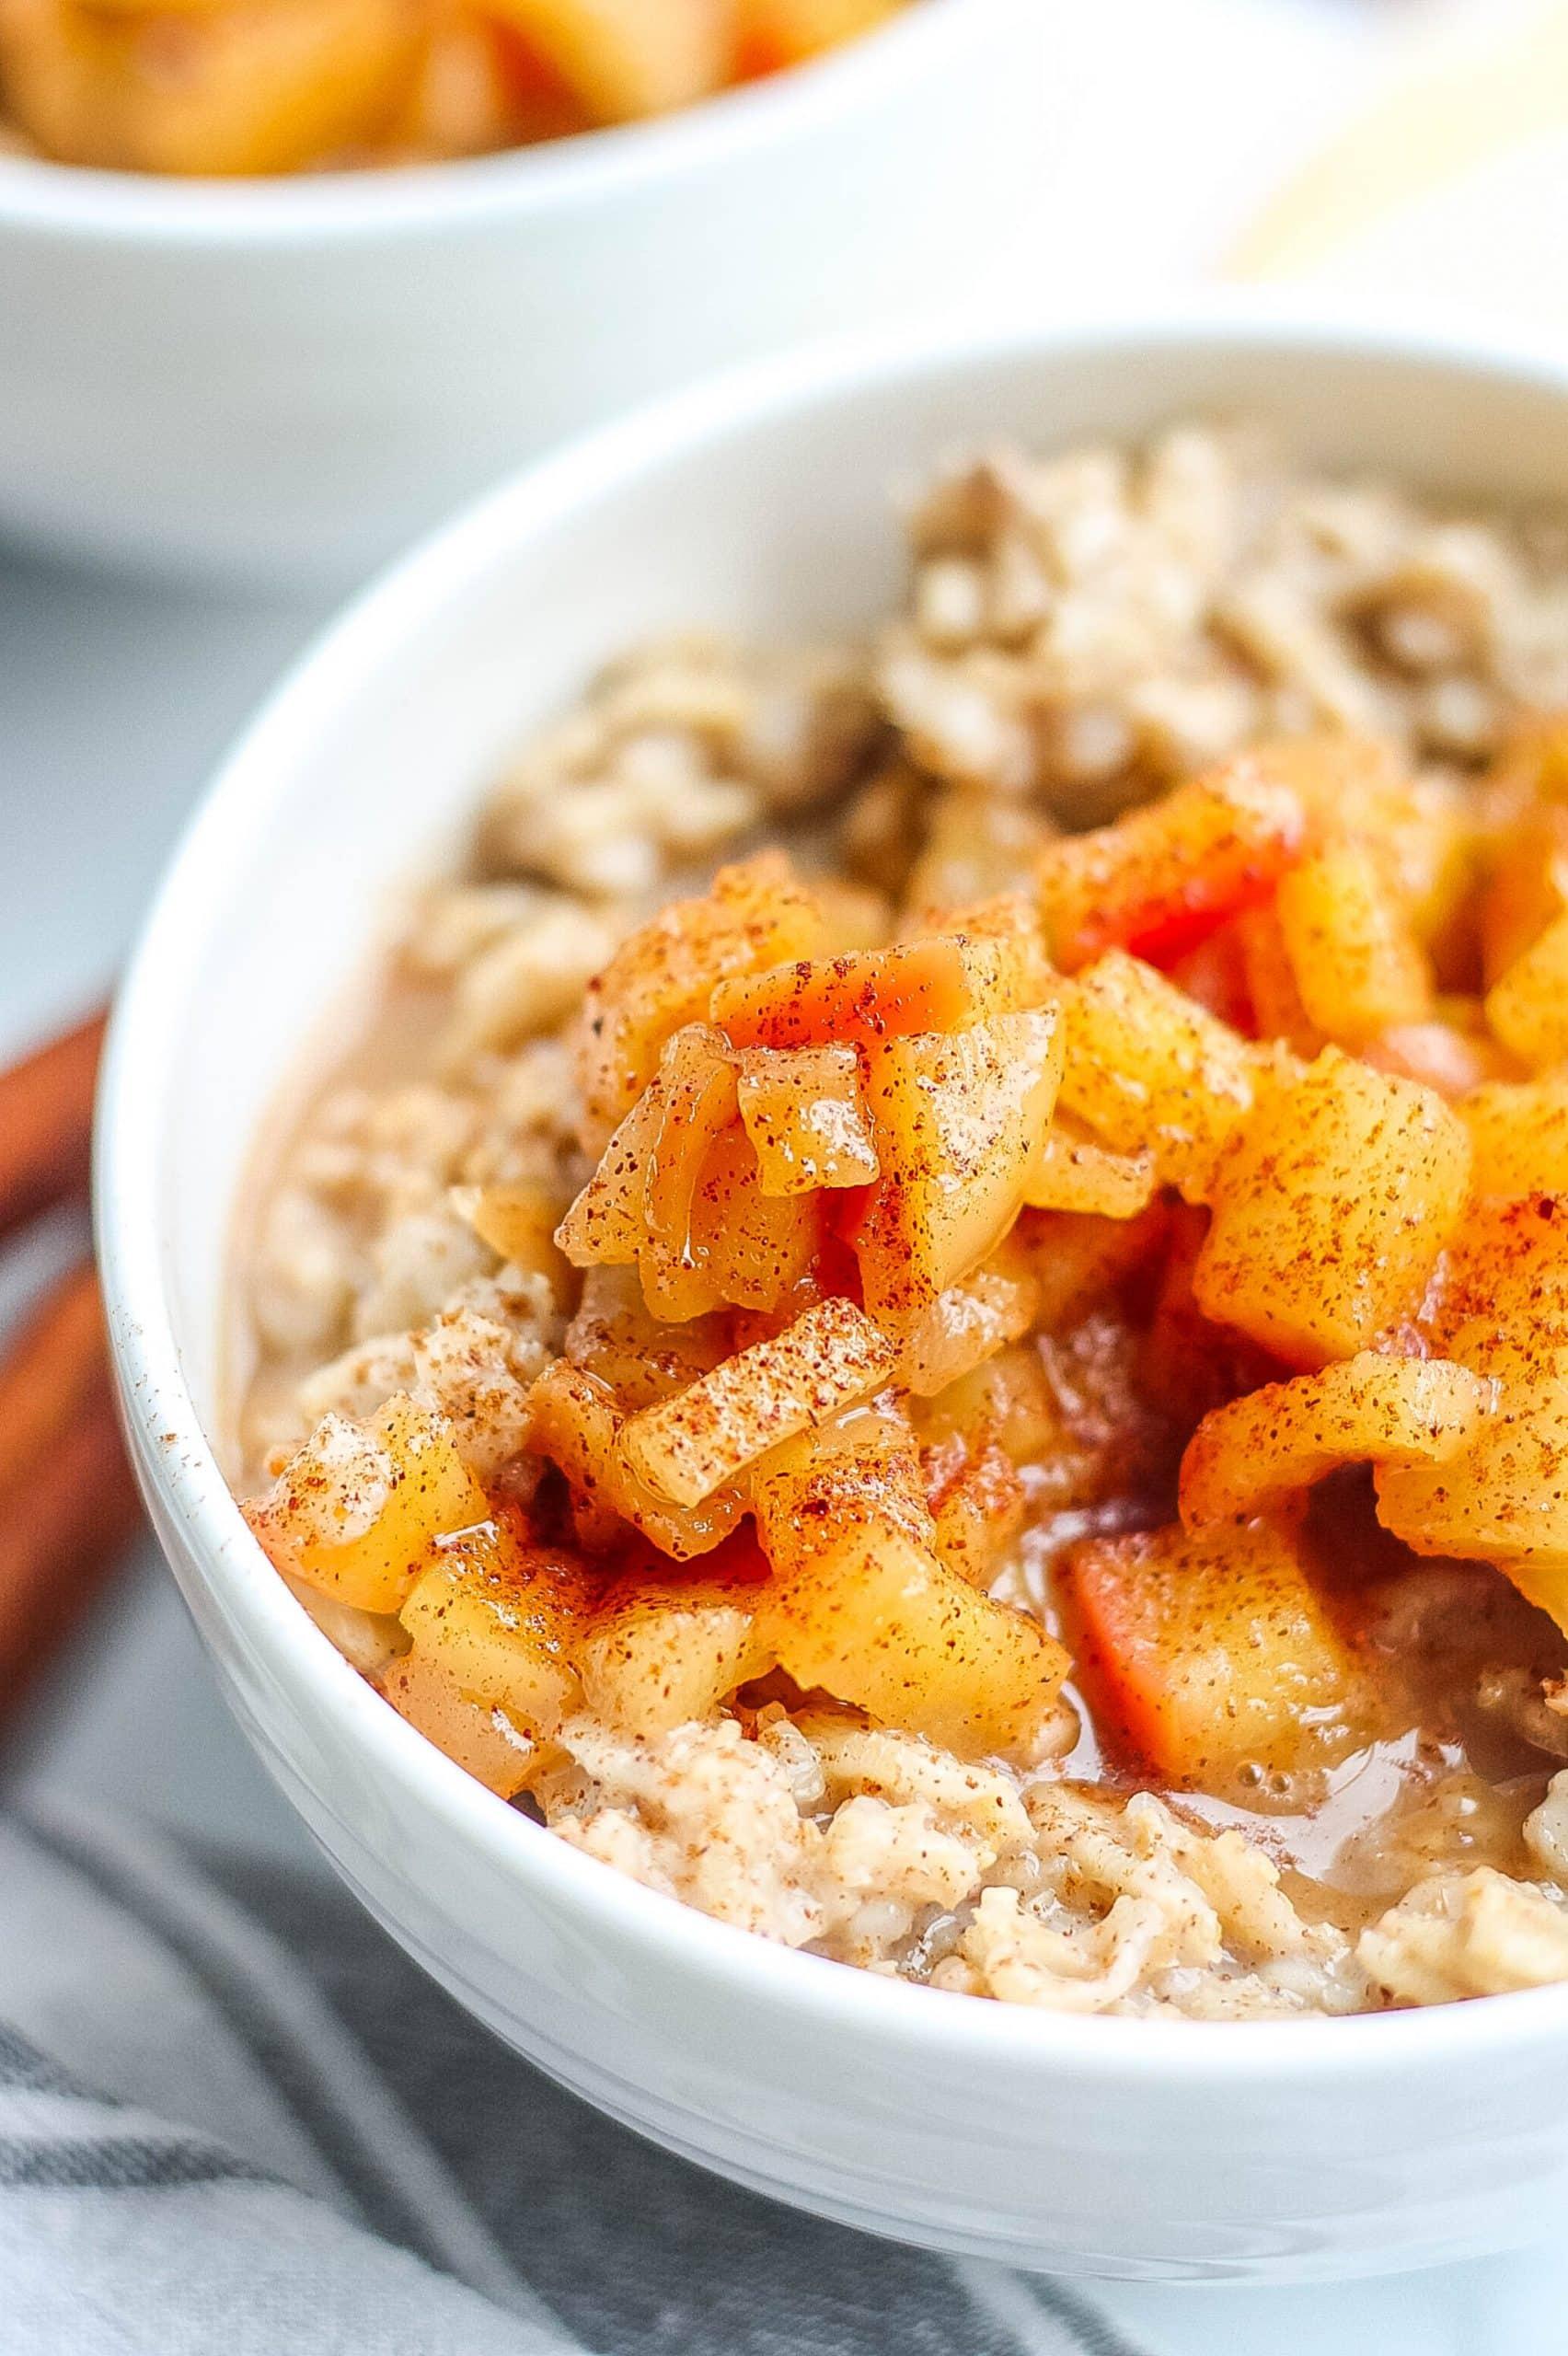 Cinnamon Apples and Oatmeal